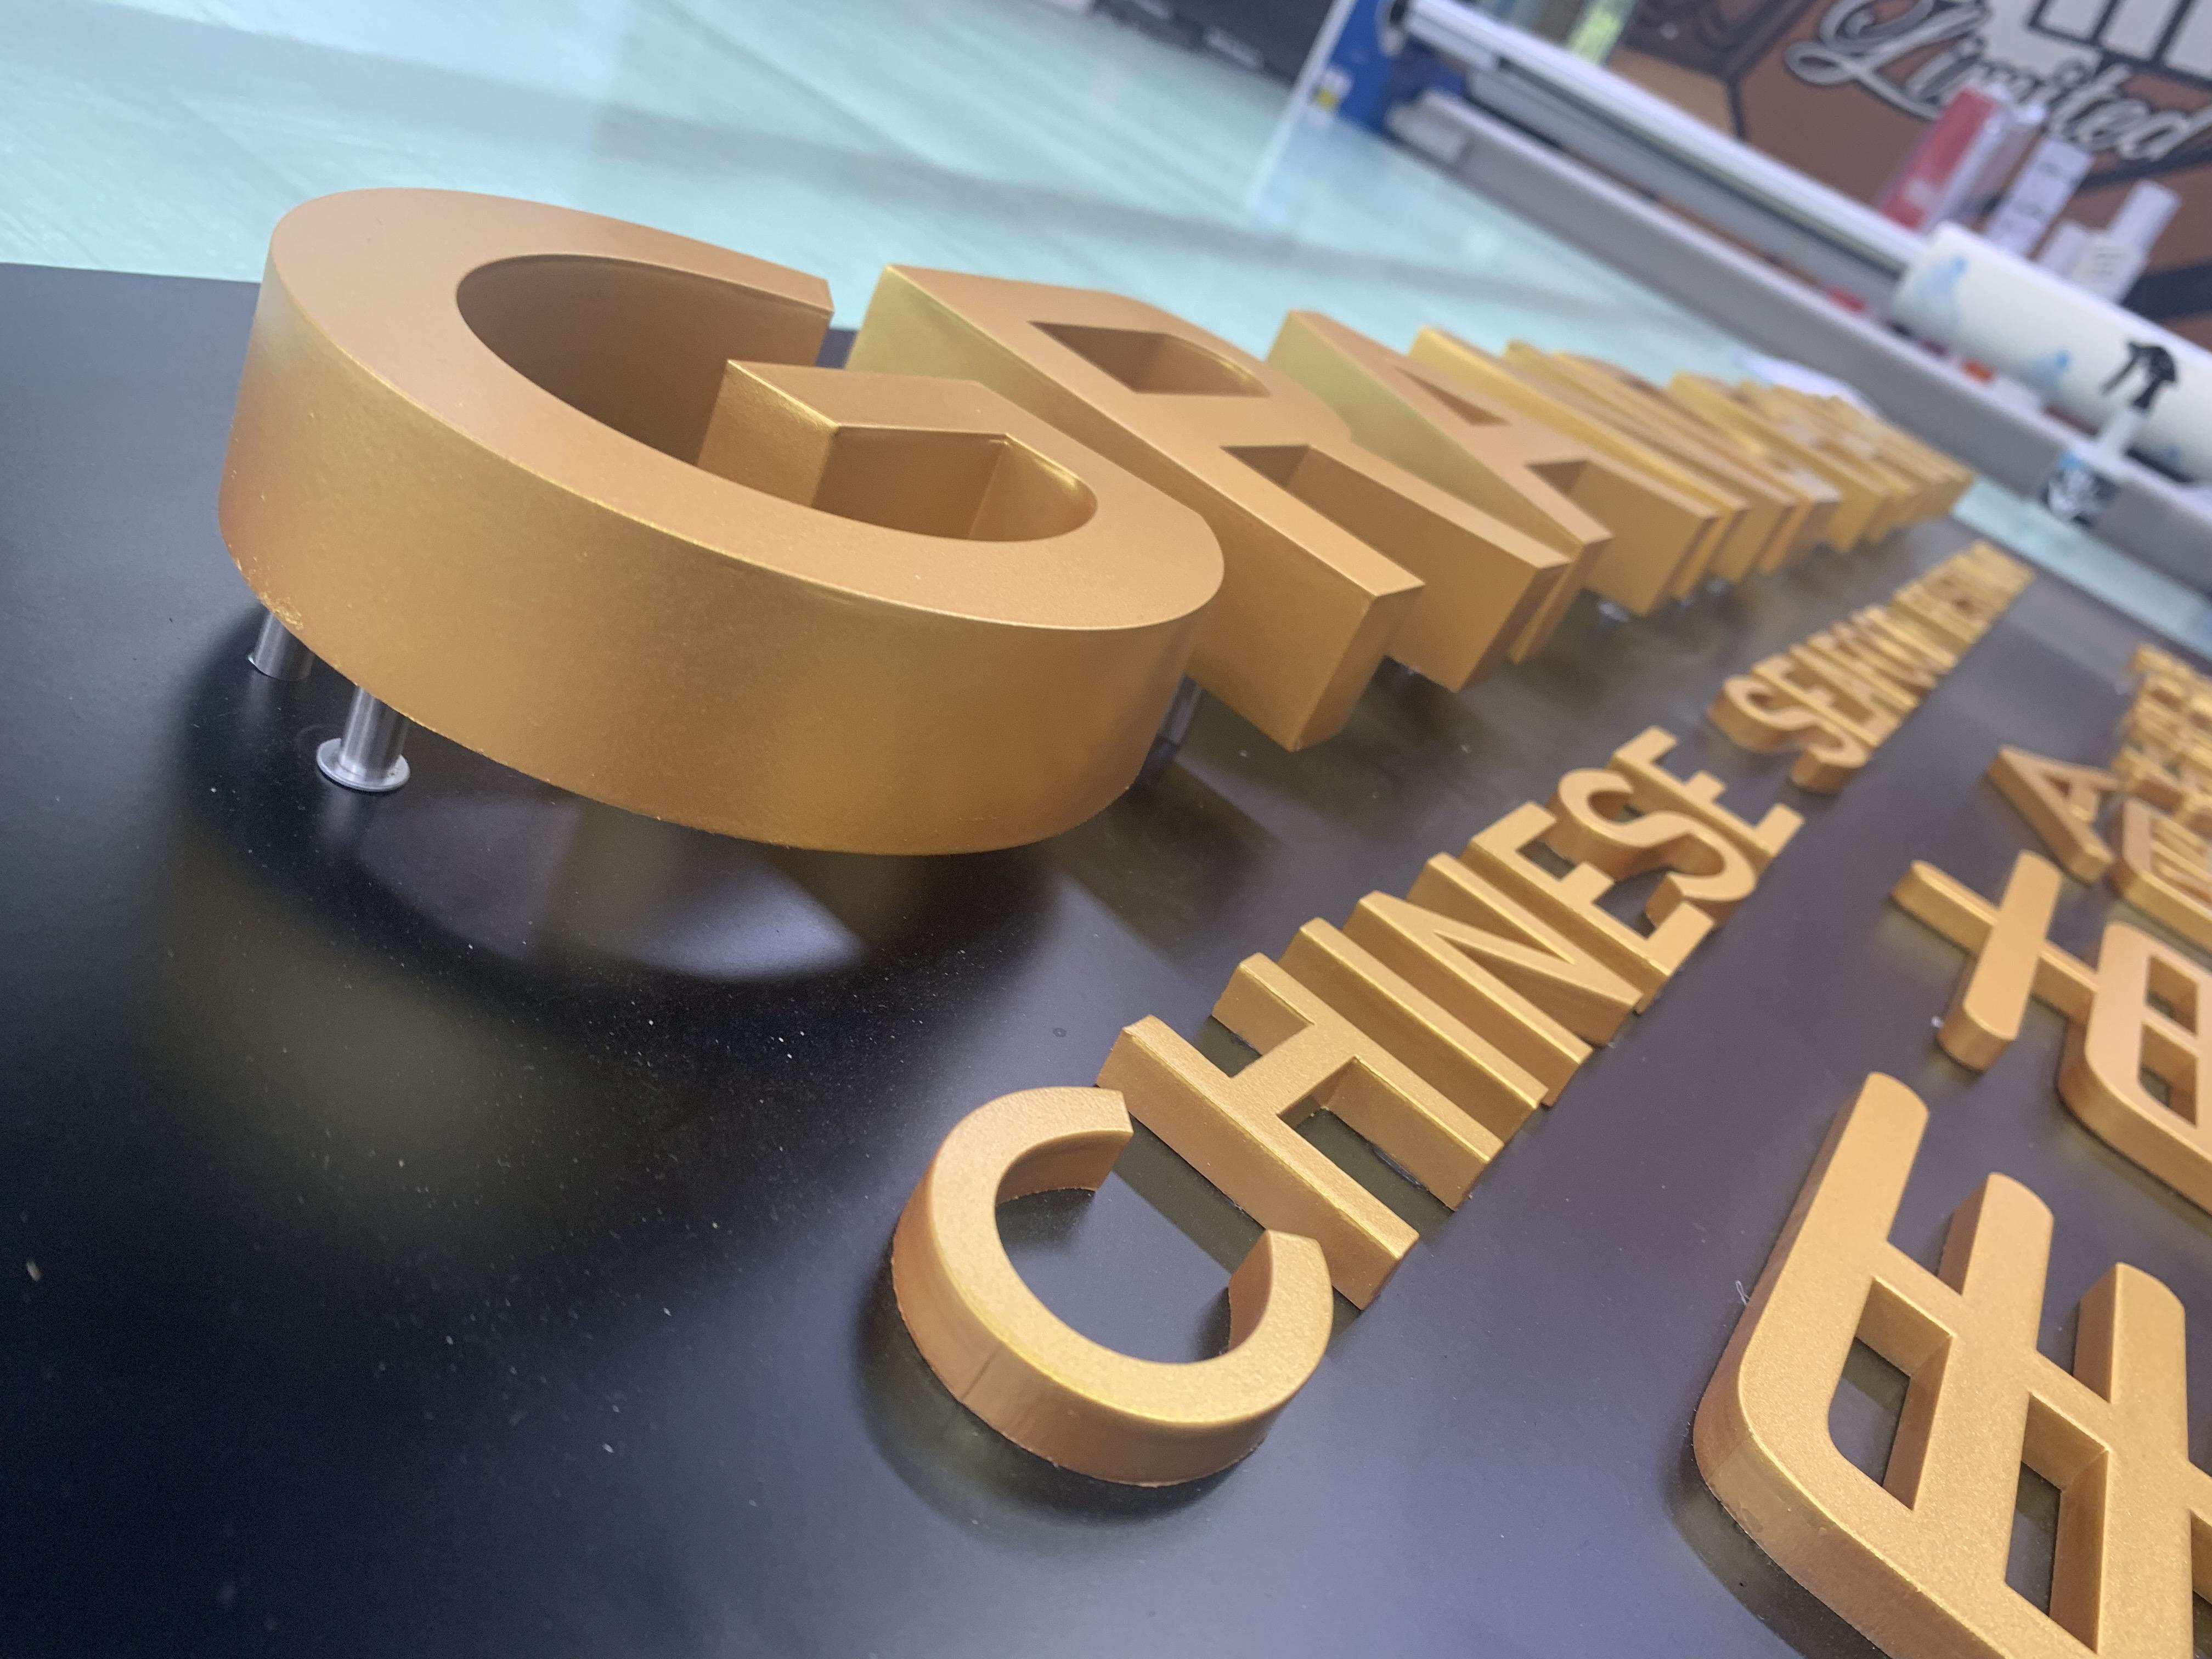 3D Halo LED letters